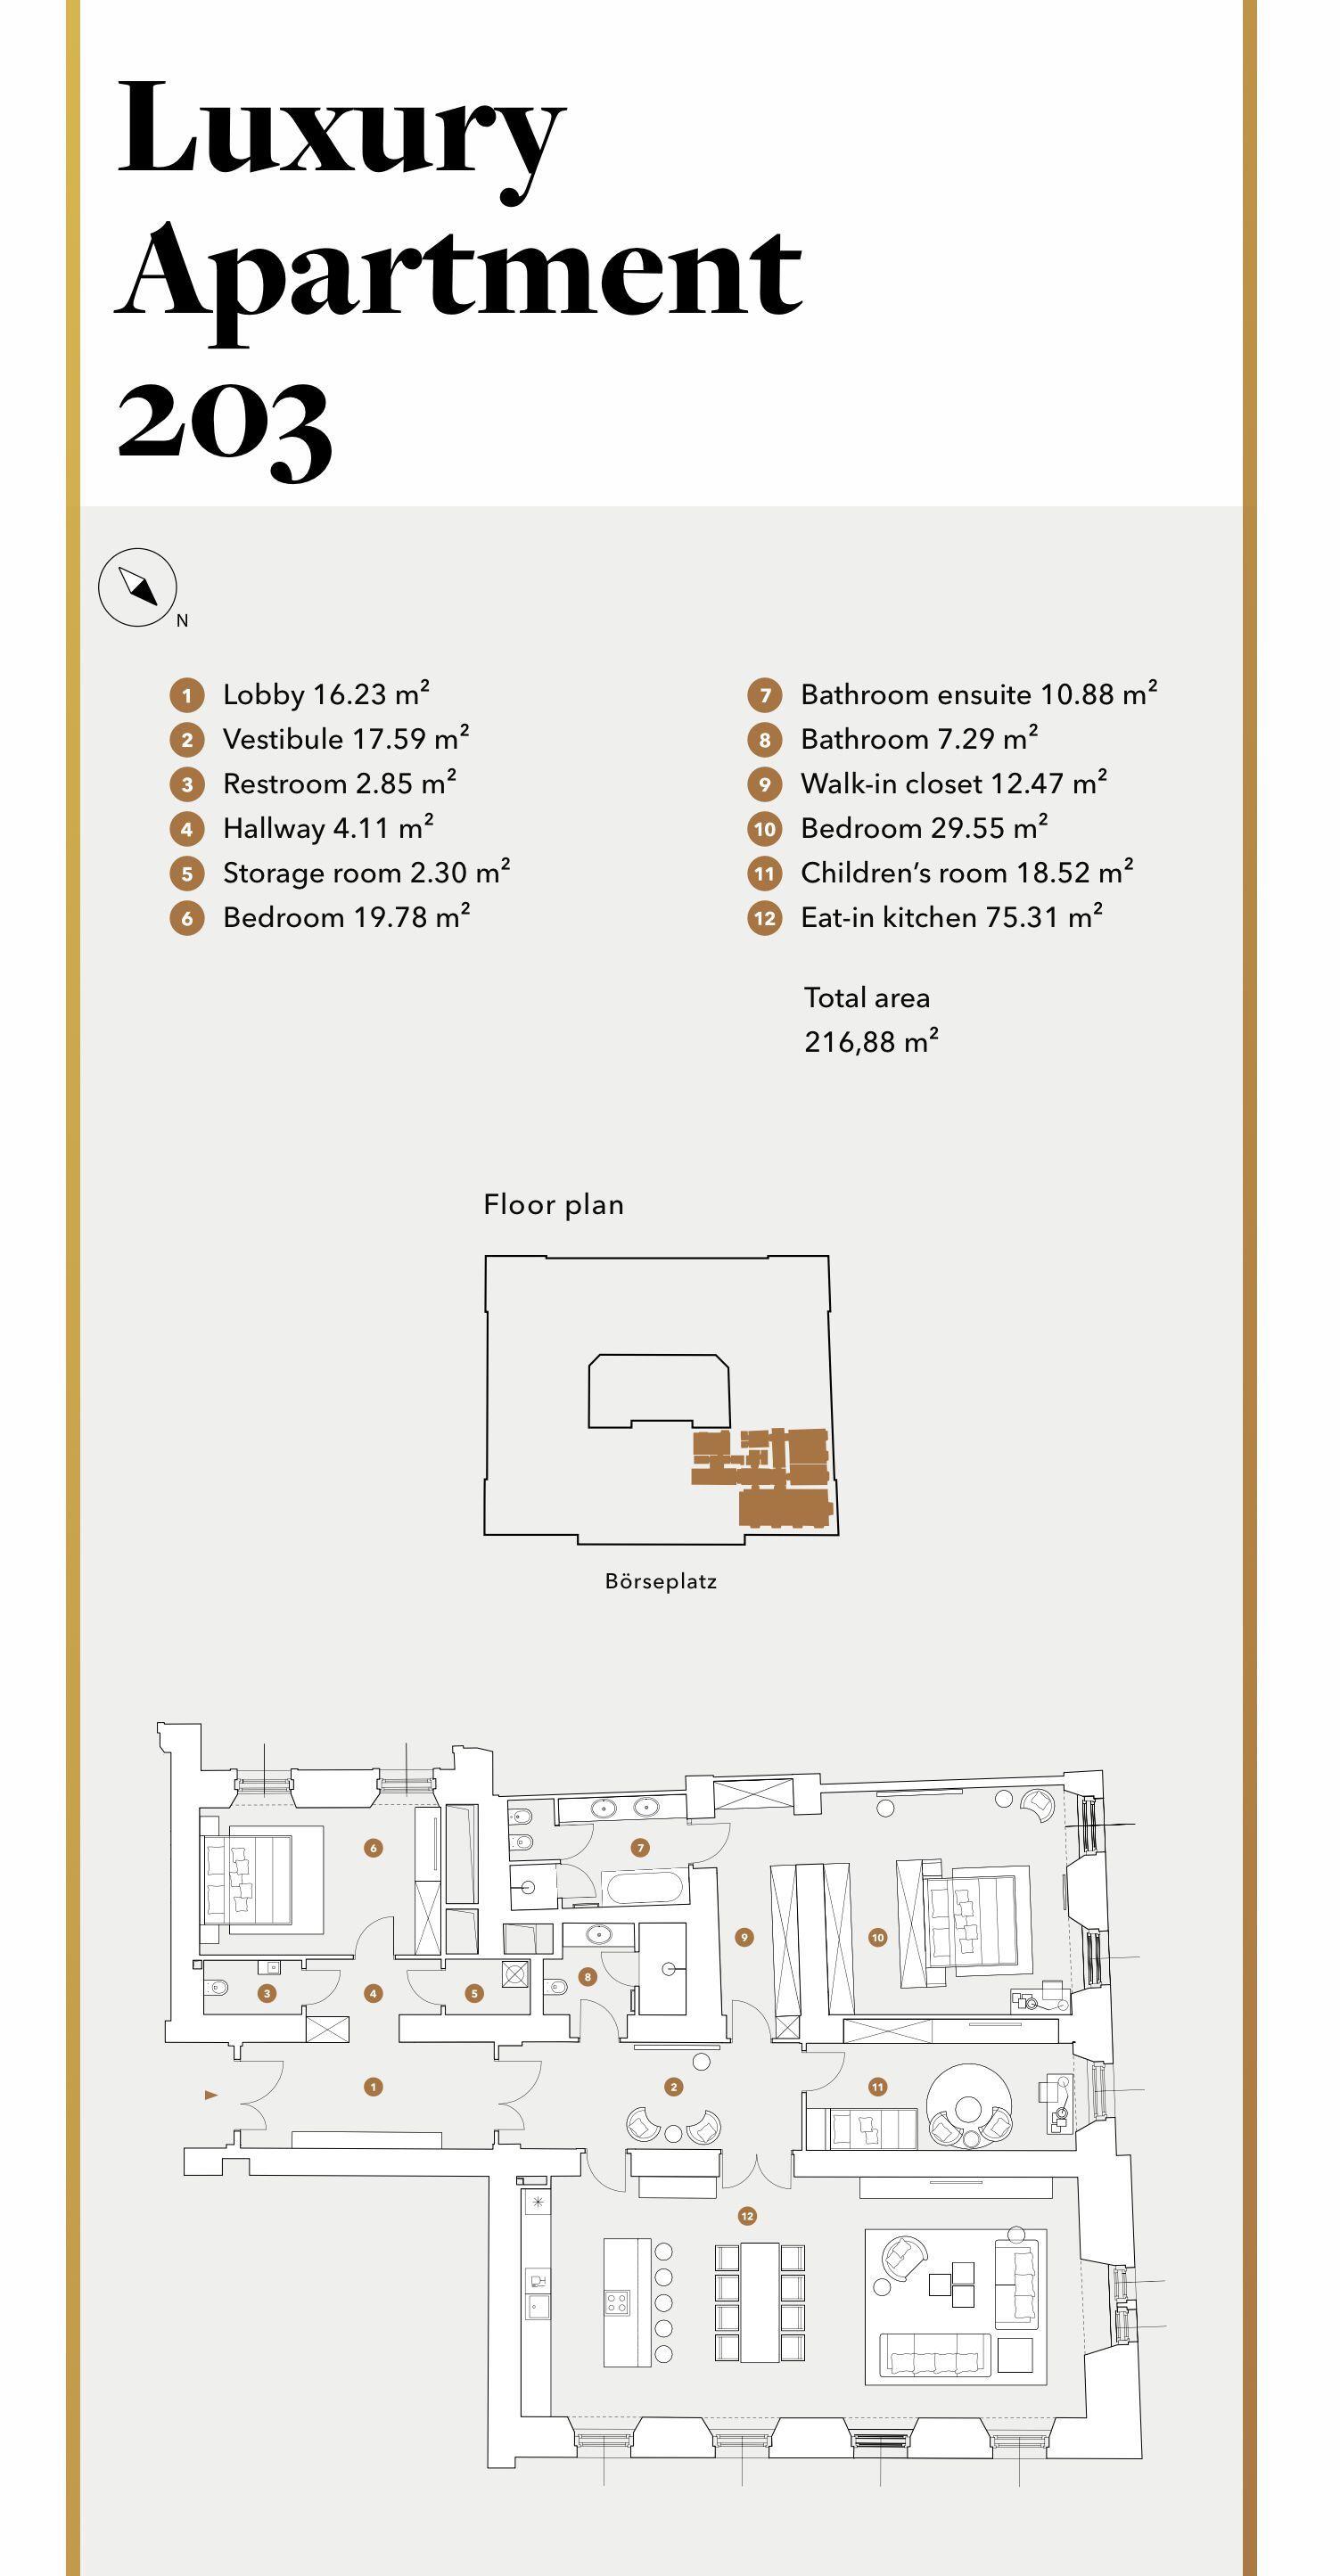 Borseplatz 1 Vienna Luxury Apartment 203 Luxury Apartments Modern Floor Plans Luxury